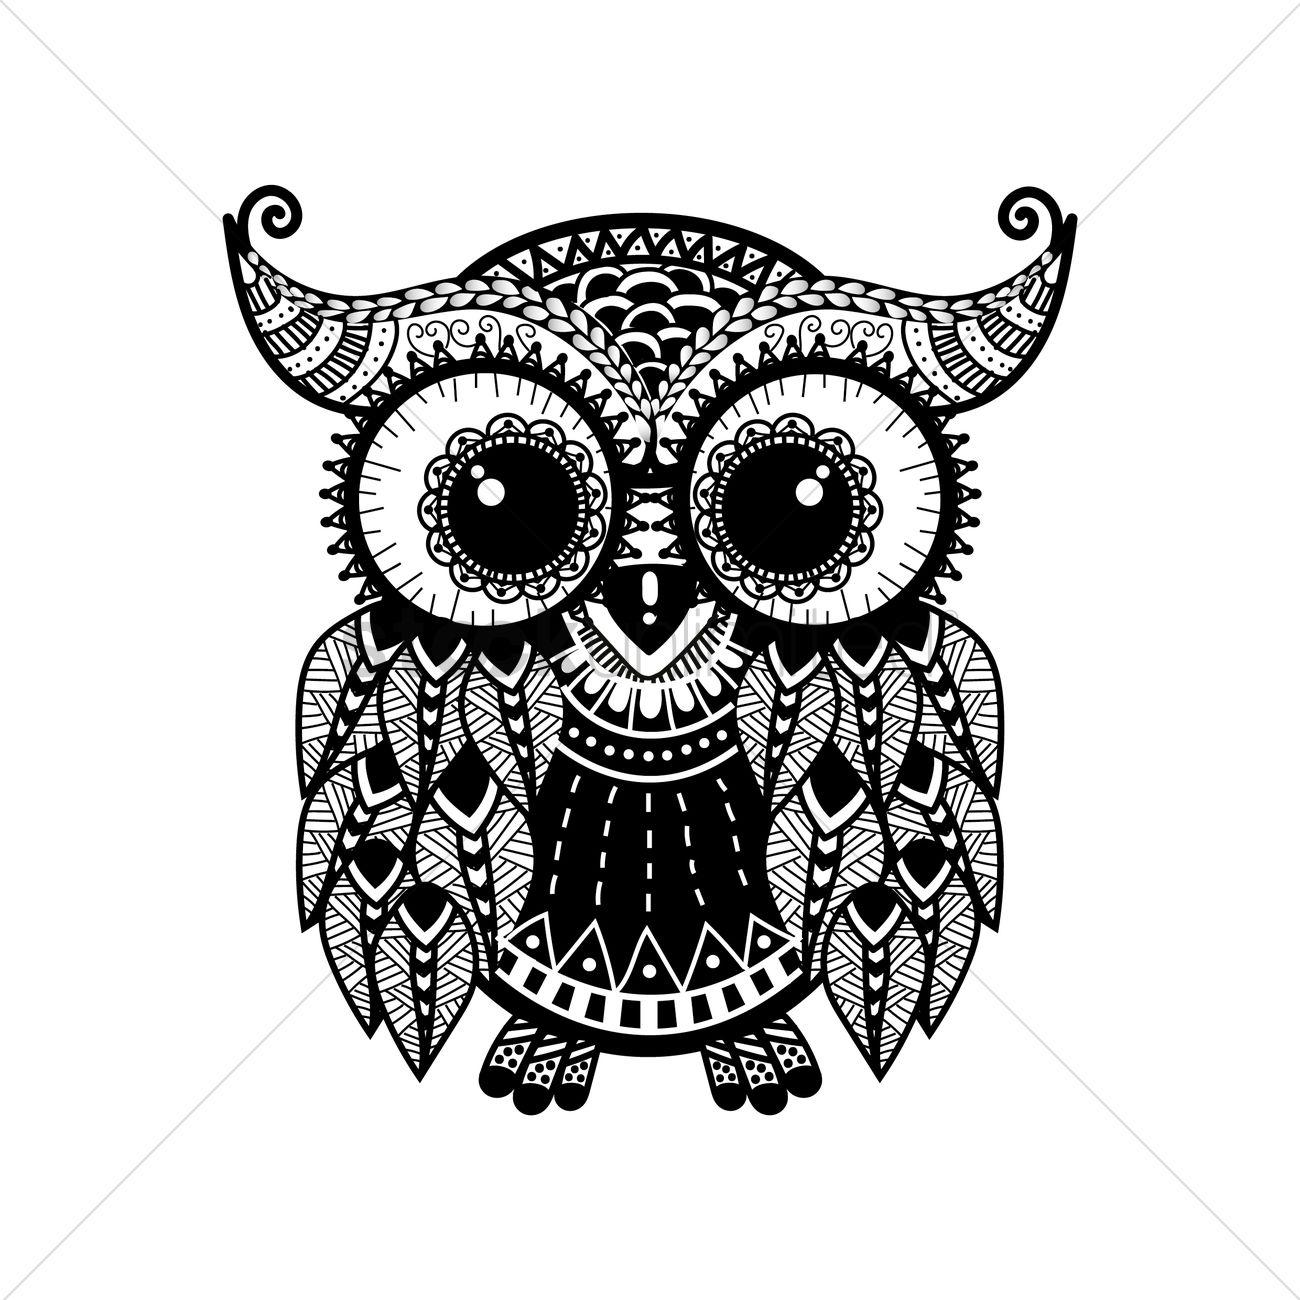 intricate owl design vector image 1544053 stockunlimited. Black Bedroom Furniture Sets. Home Design Ideas